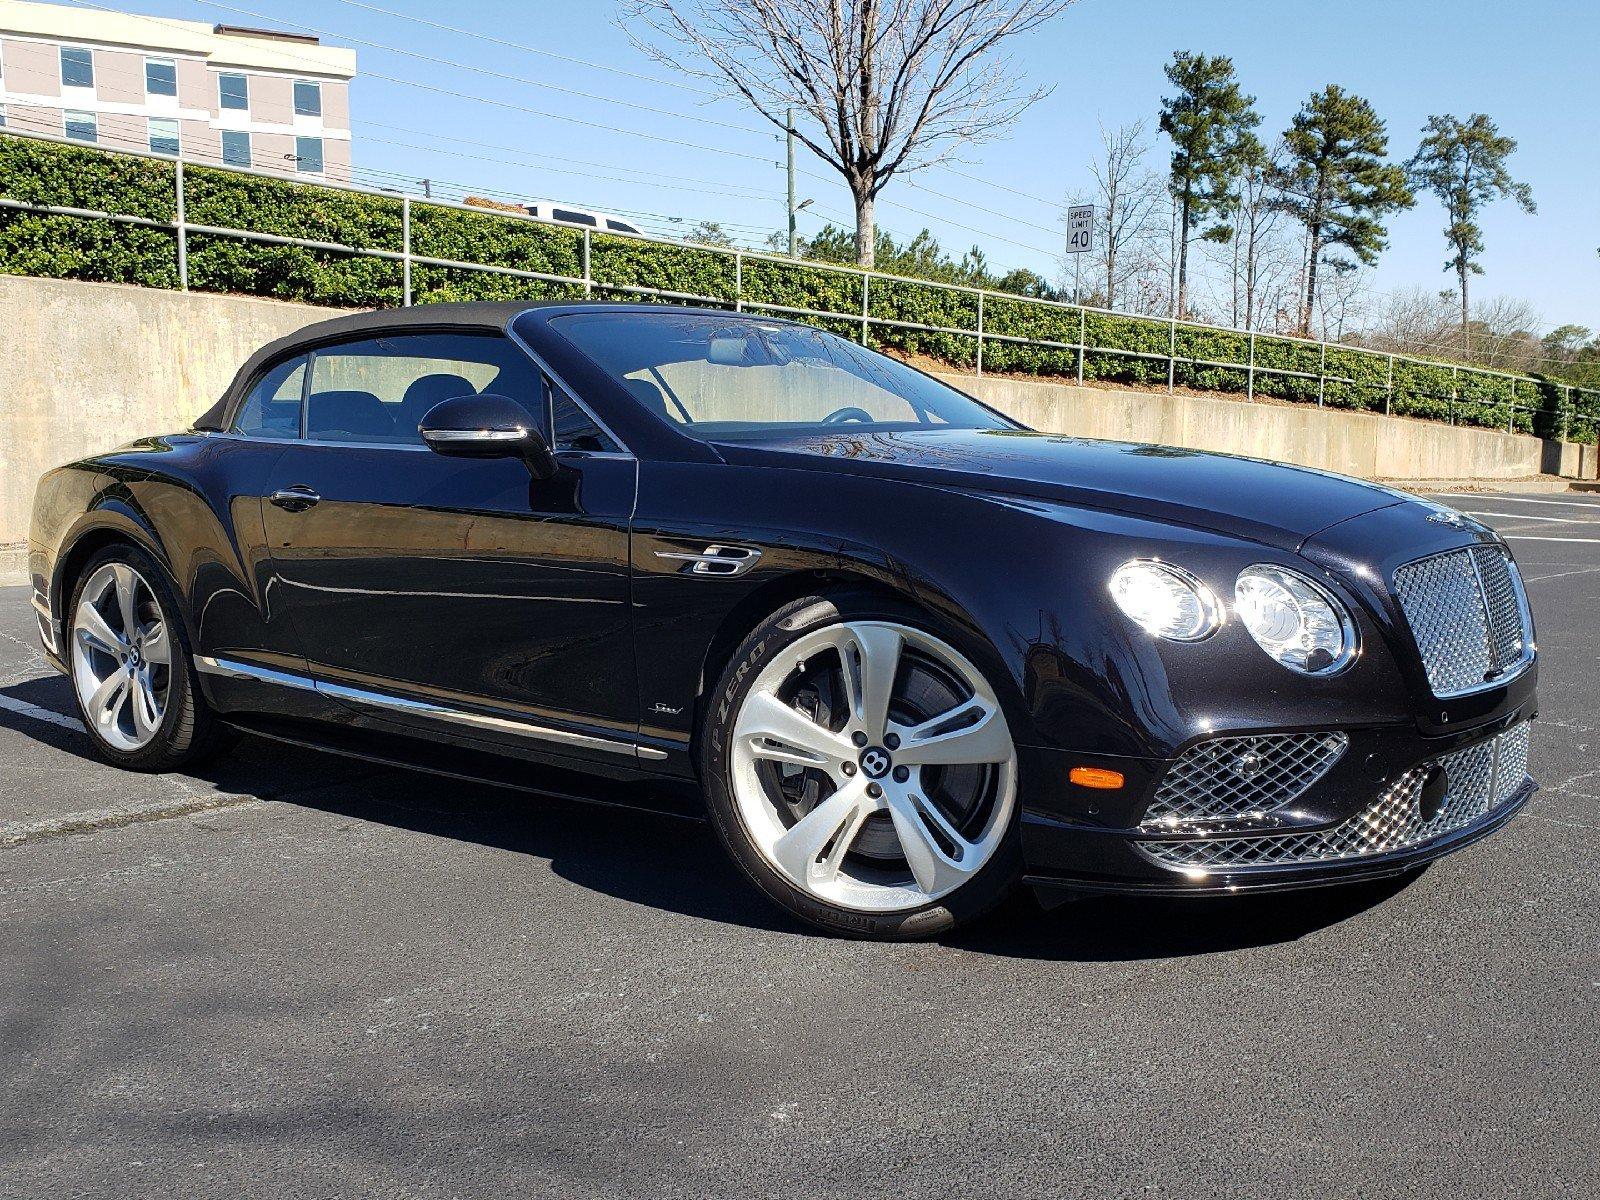 2016 Bentley Continental GTC Speed Convertible image